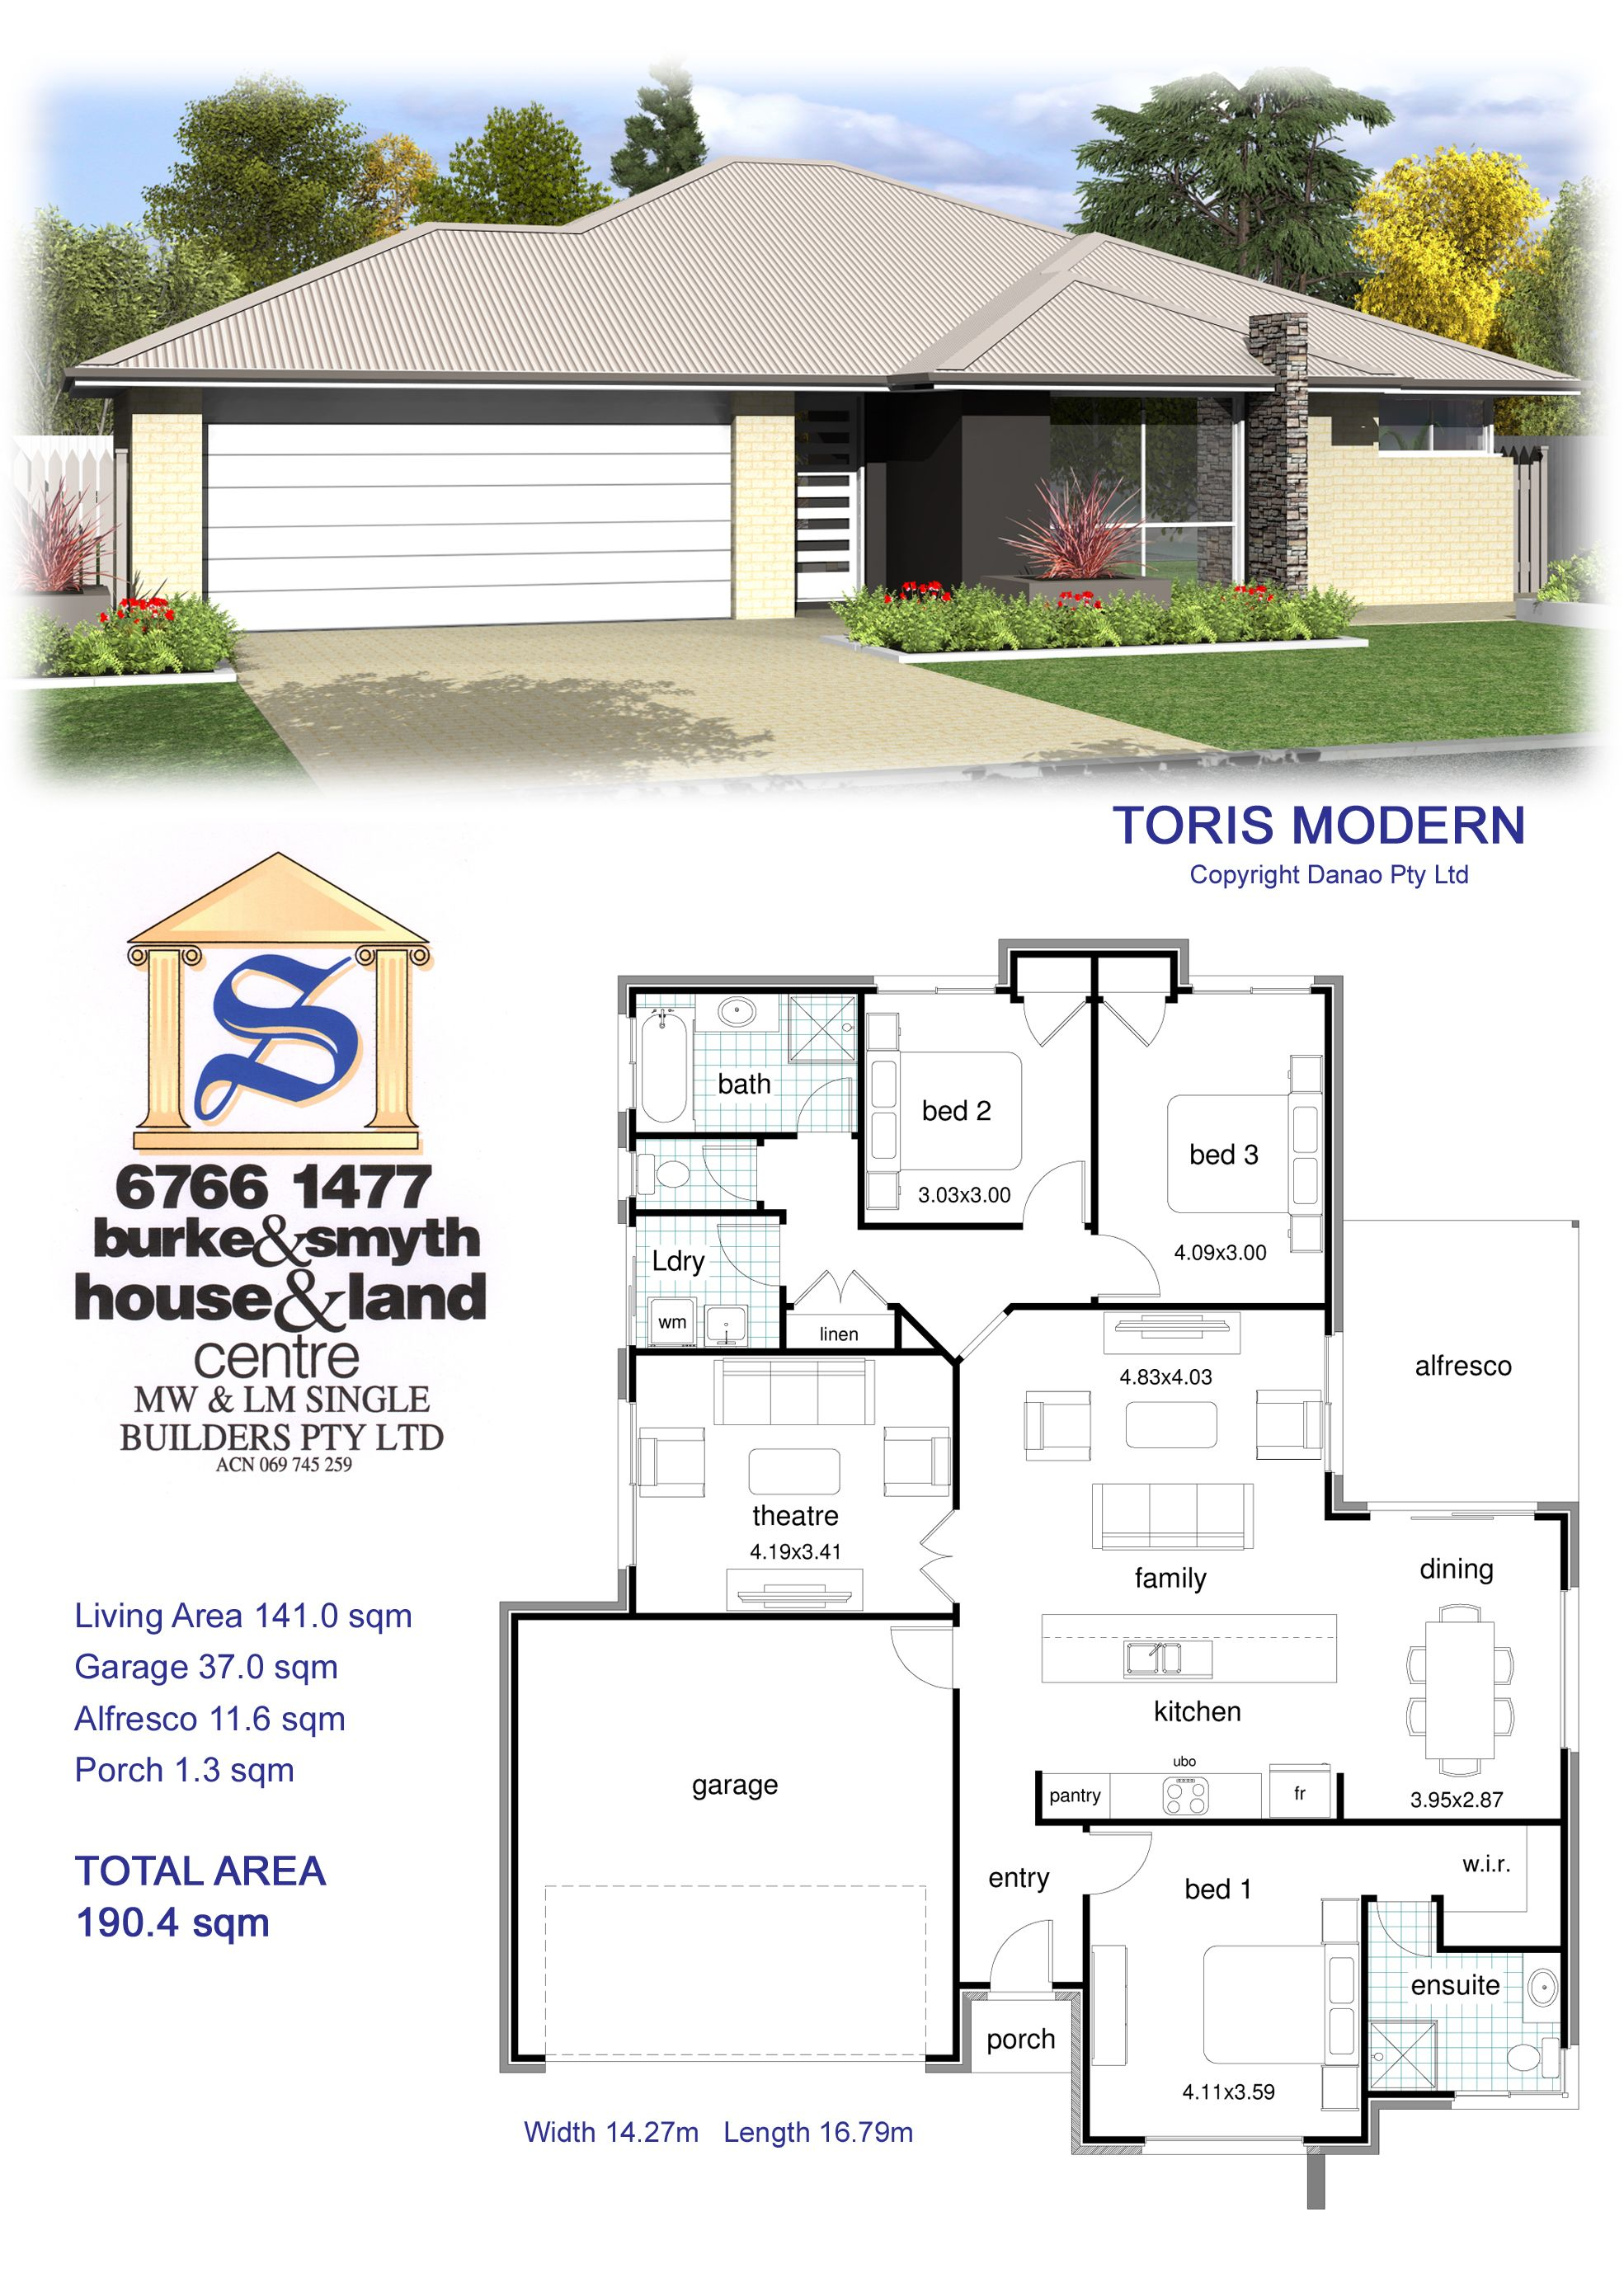 Single Builders I Toris Modern House Plan House Plan Gallery Free House Plans Affordable House Plans